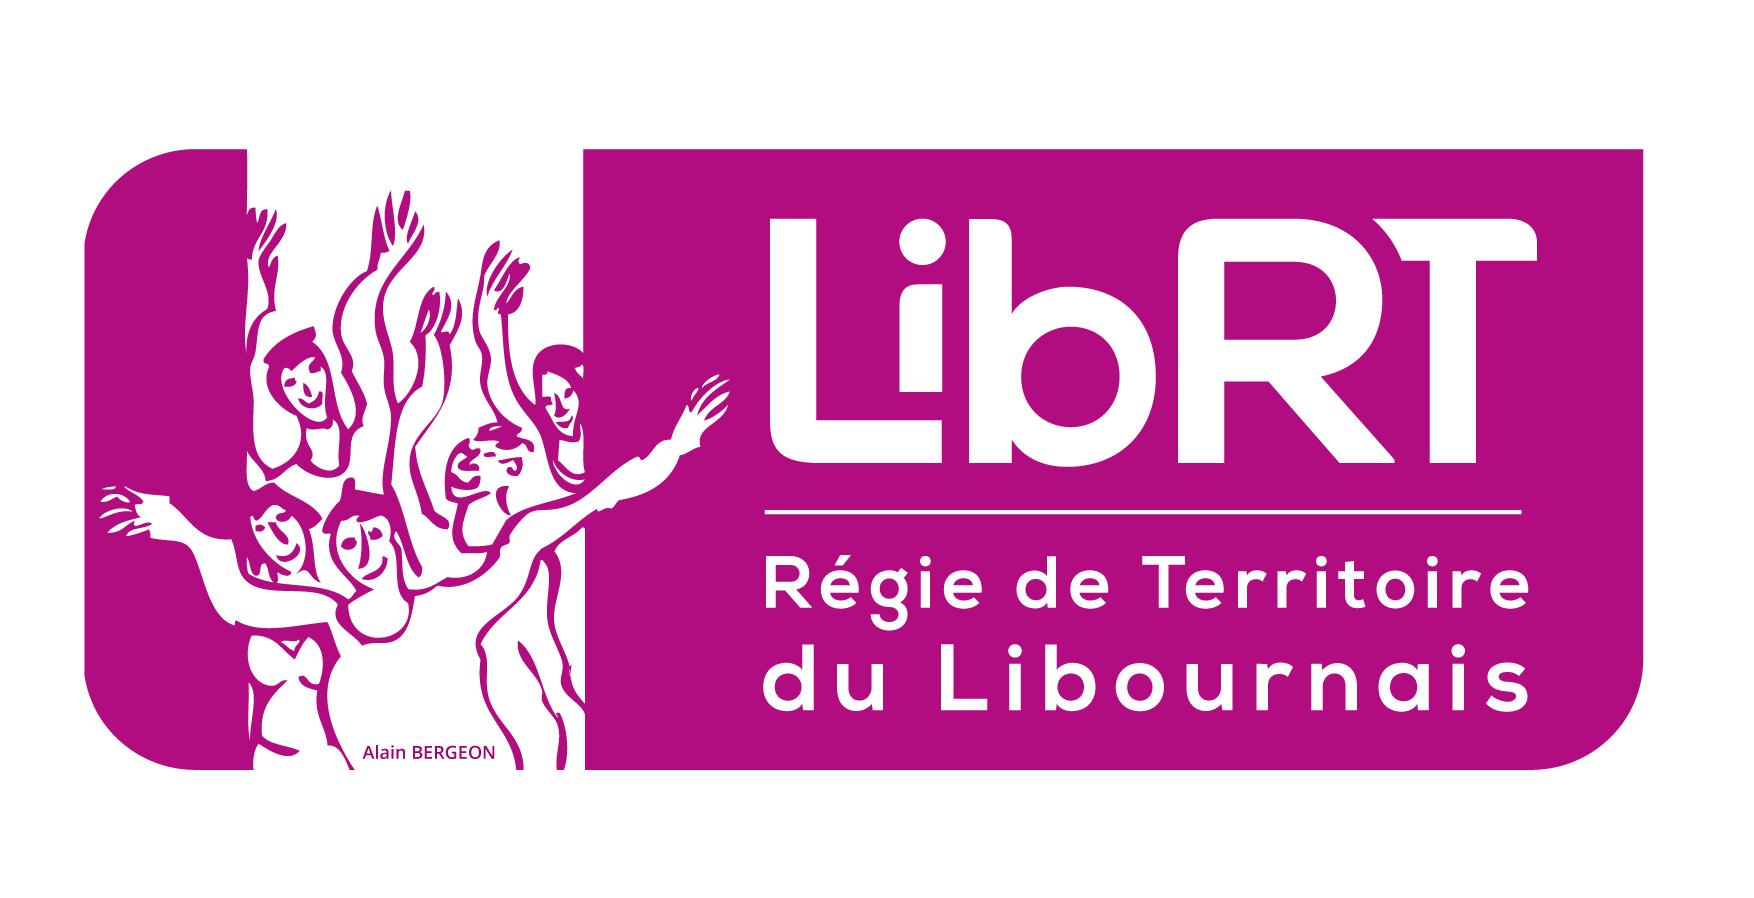 logo_2073_logo_librt_officiel.jpg